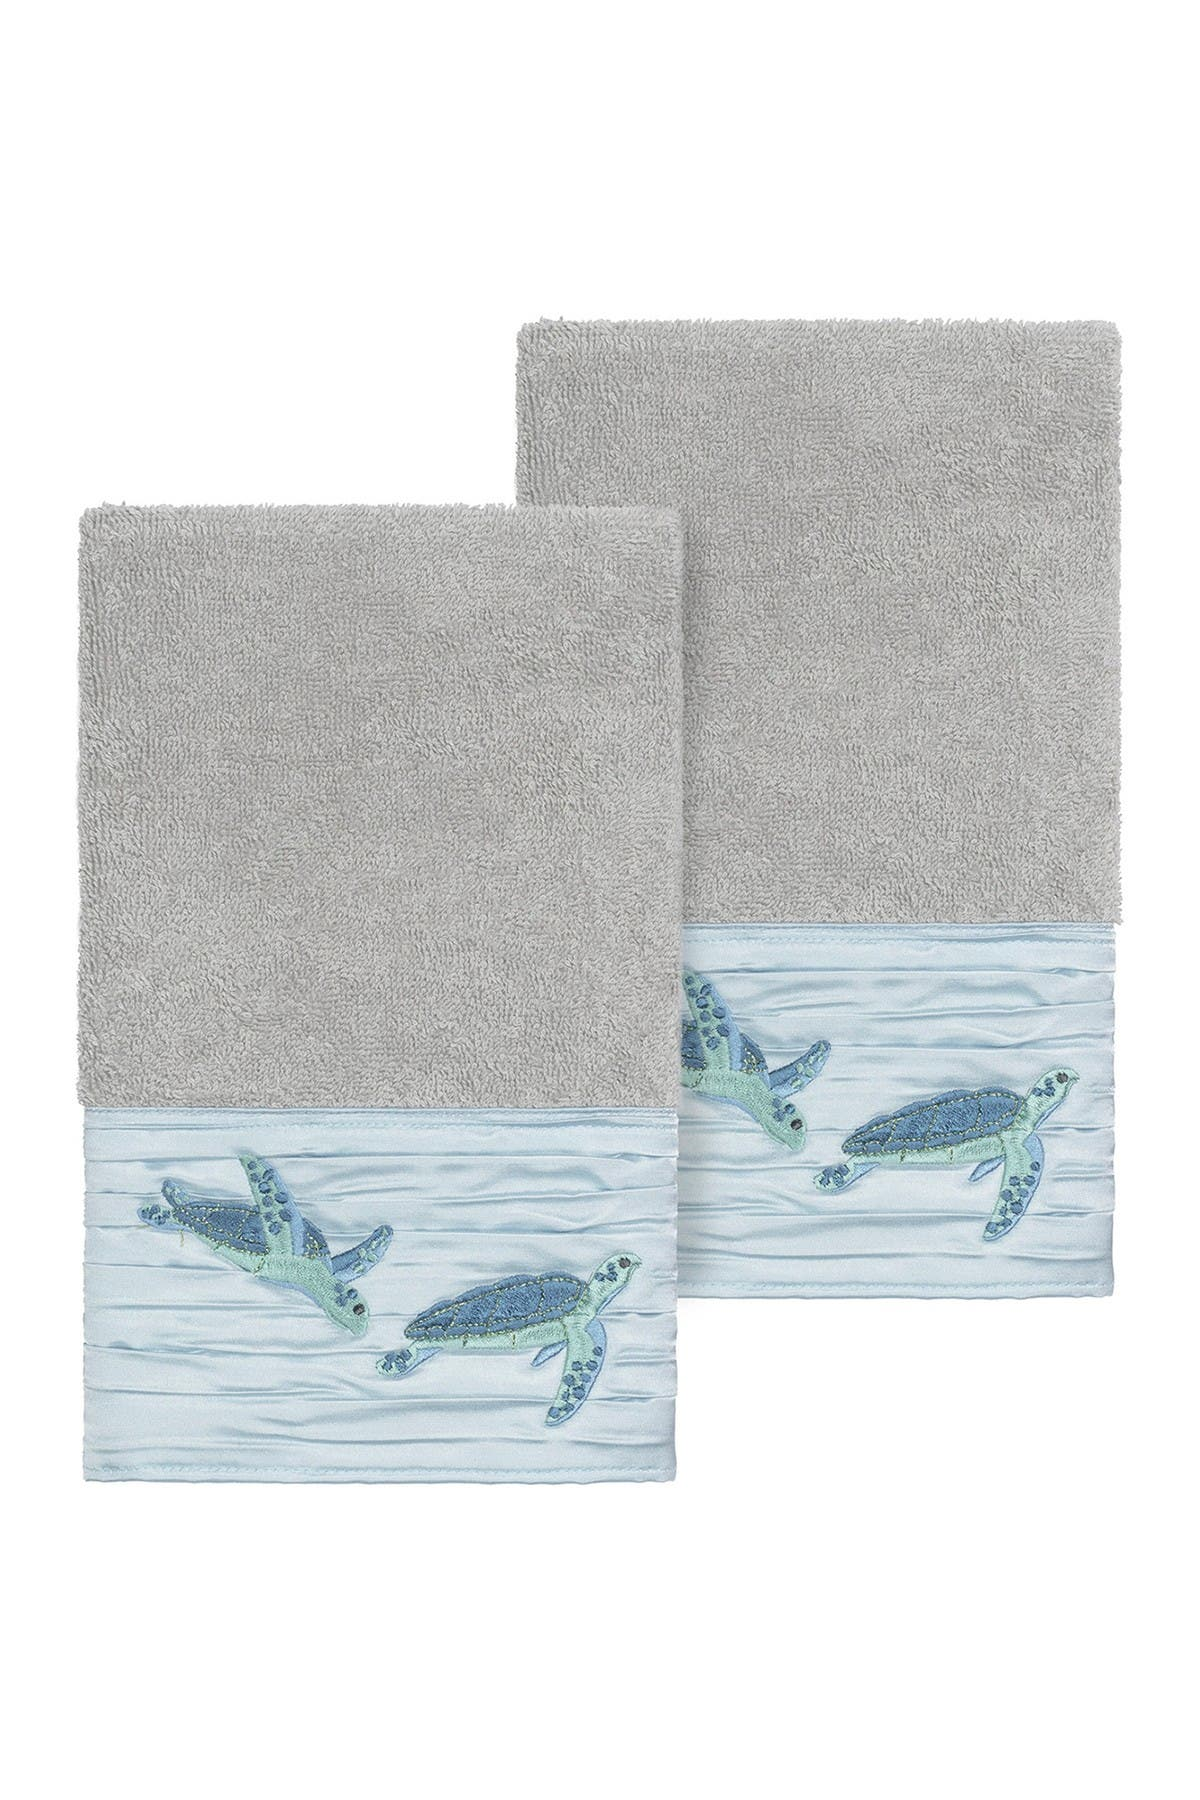 Image of LINUM HOME Mia Embellished Hand Towel - Set of 2 - Light Grey